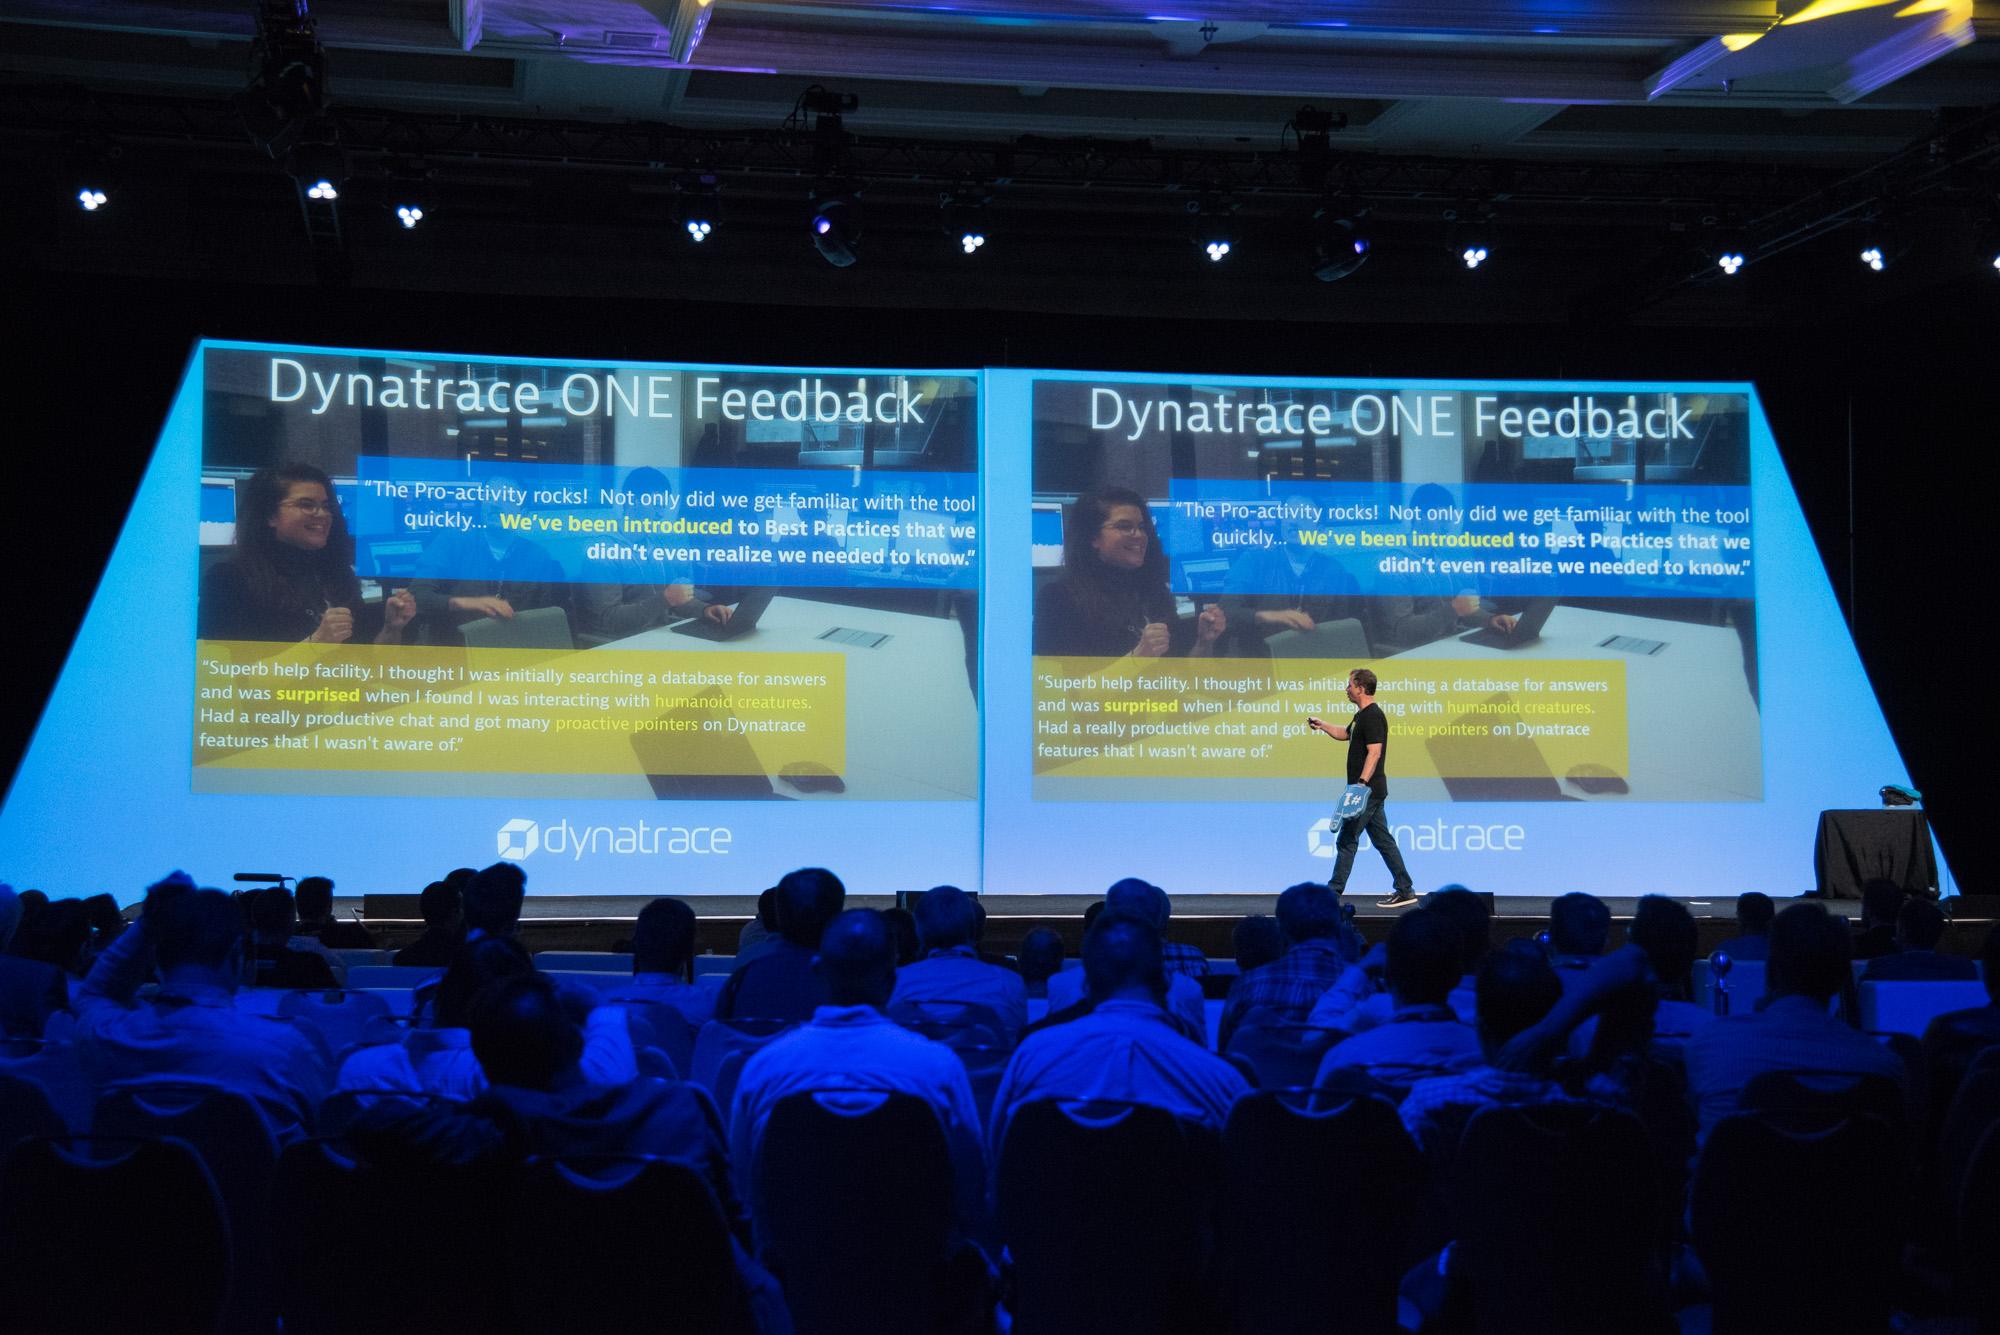 Main stage presentation